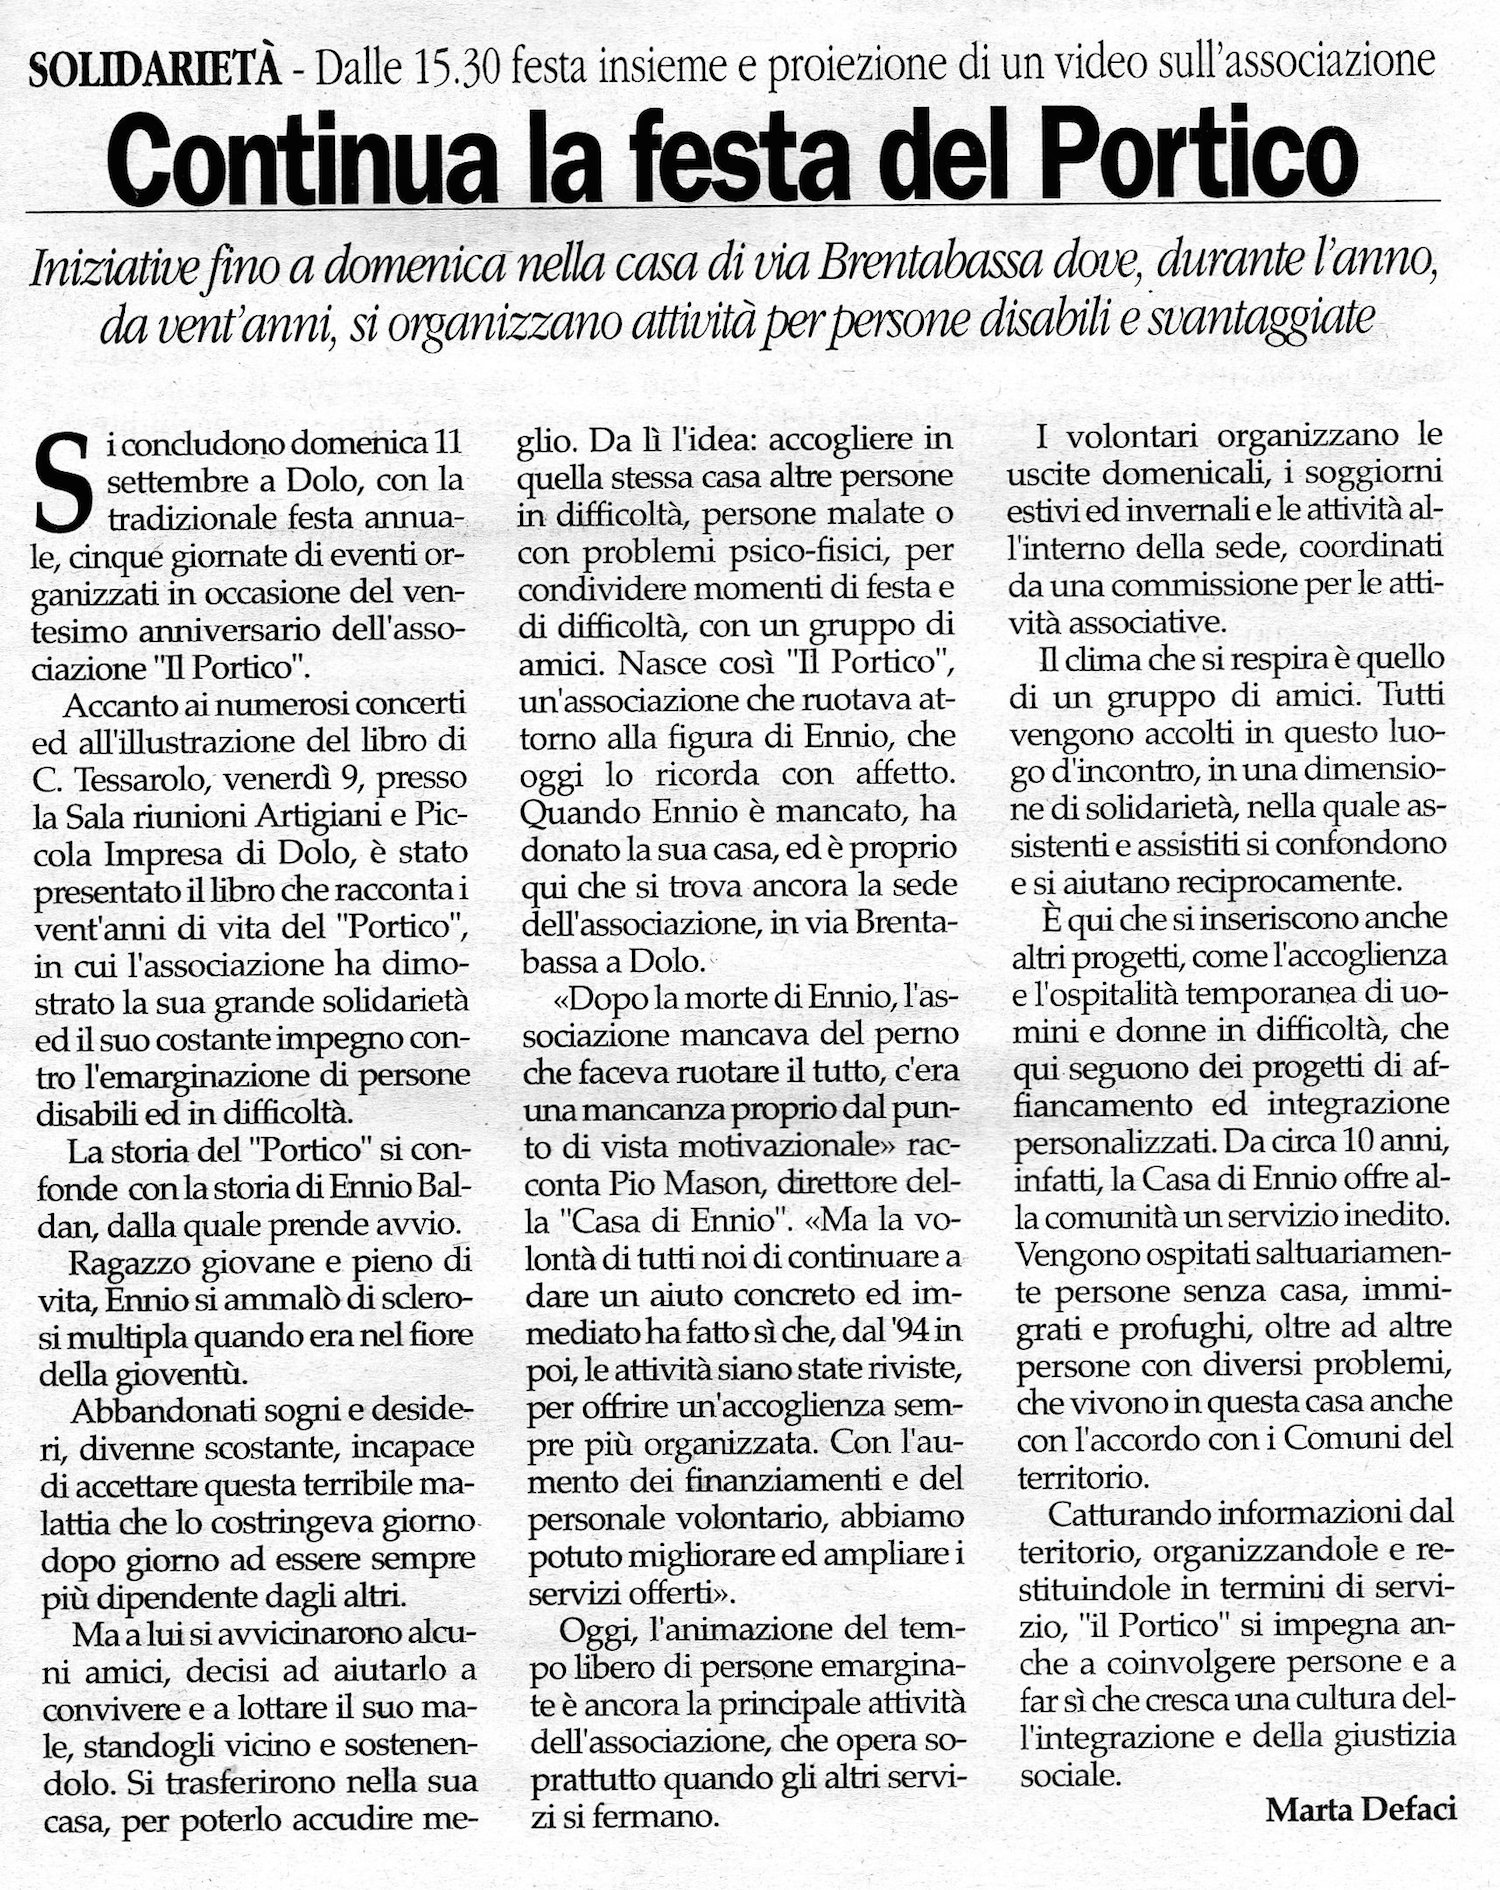 2005.09.10 Gente Veneta (p. 22)